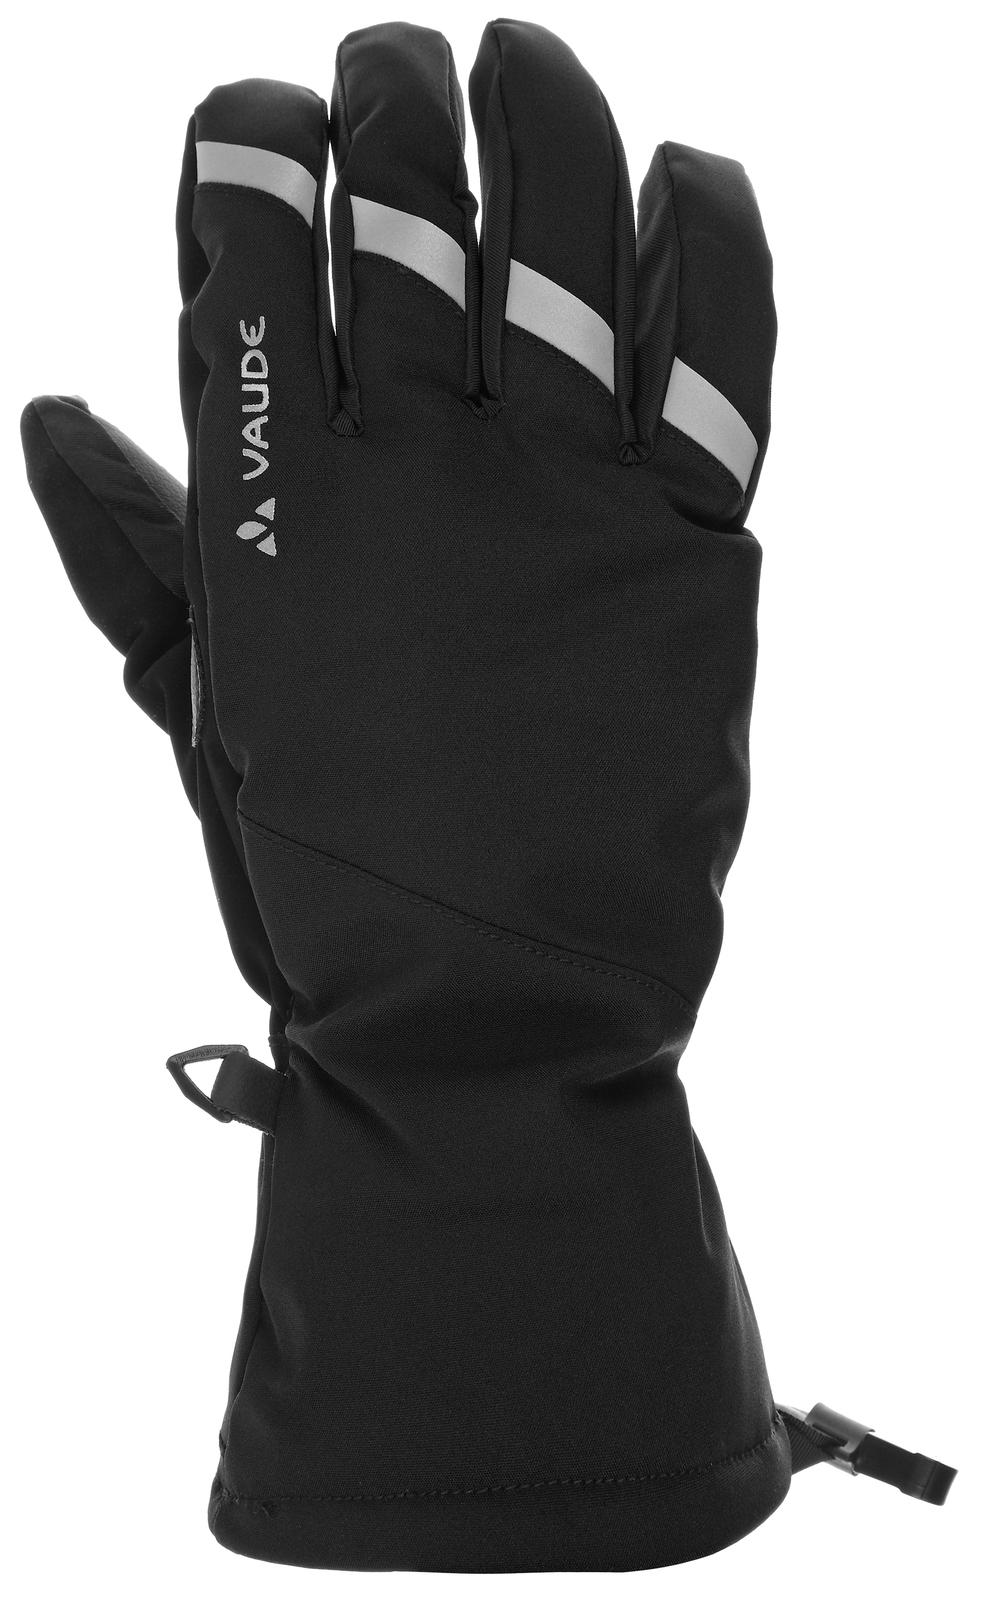 VAUDE Tura Gloves II black Größe 9 - VAUDE Tura Gloves II black Größe 9